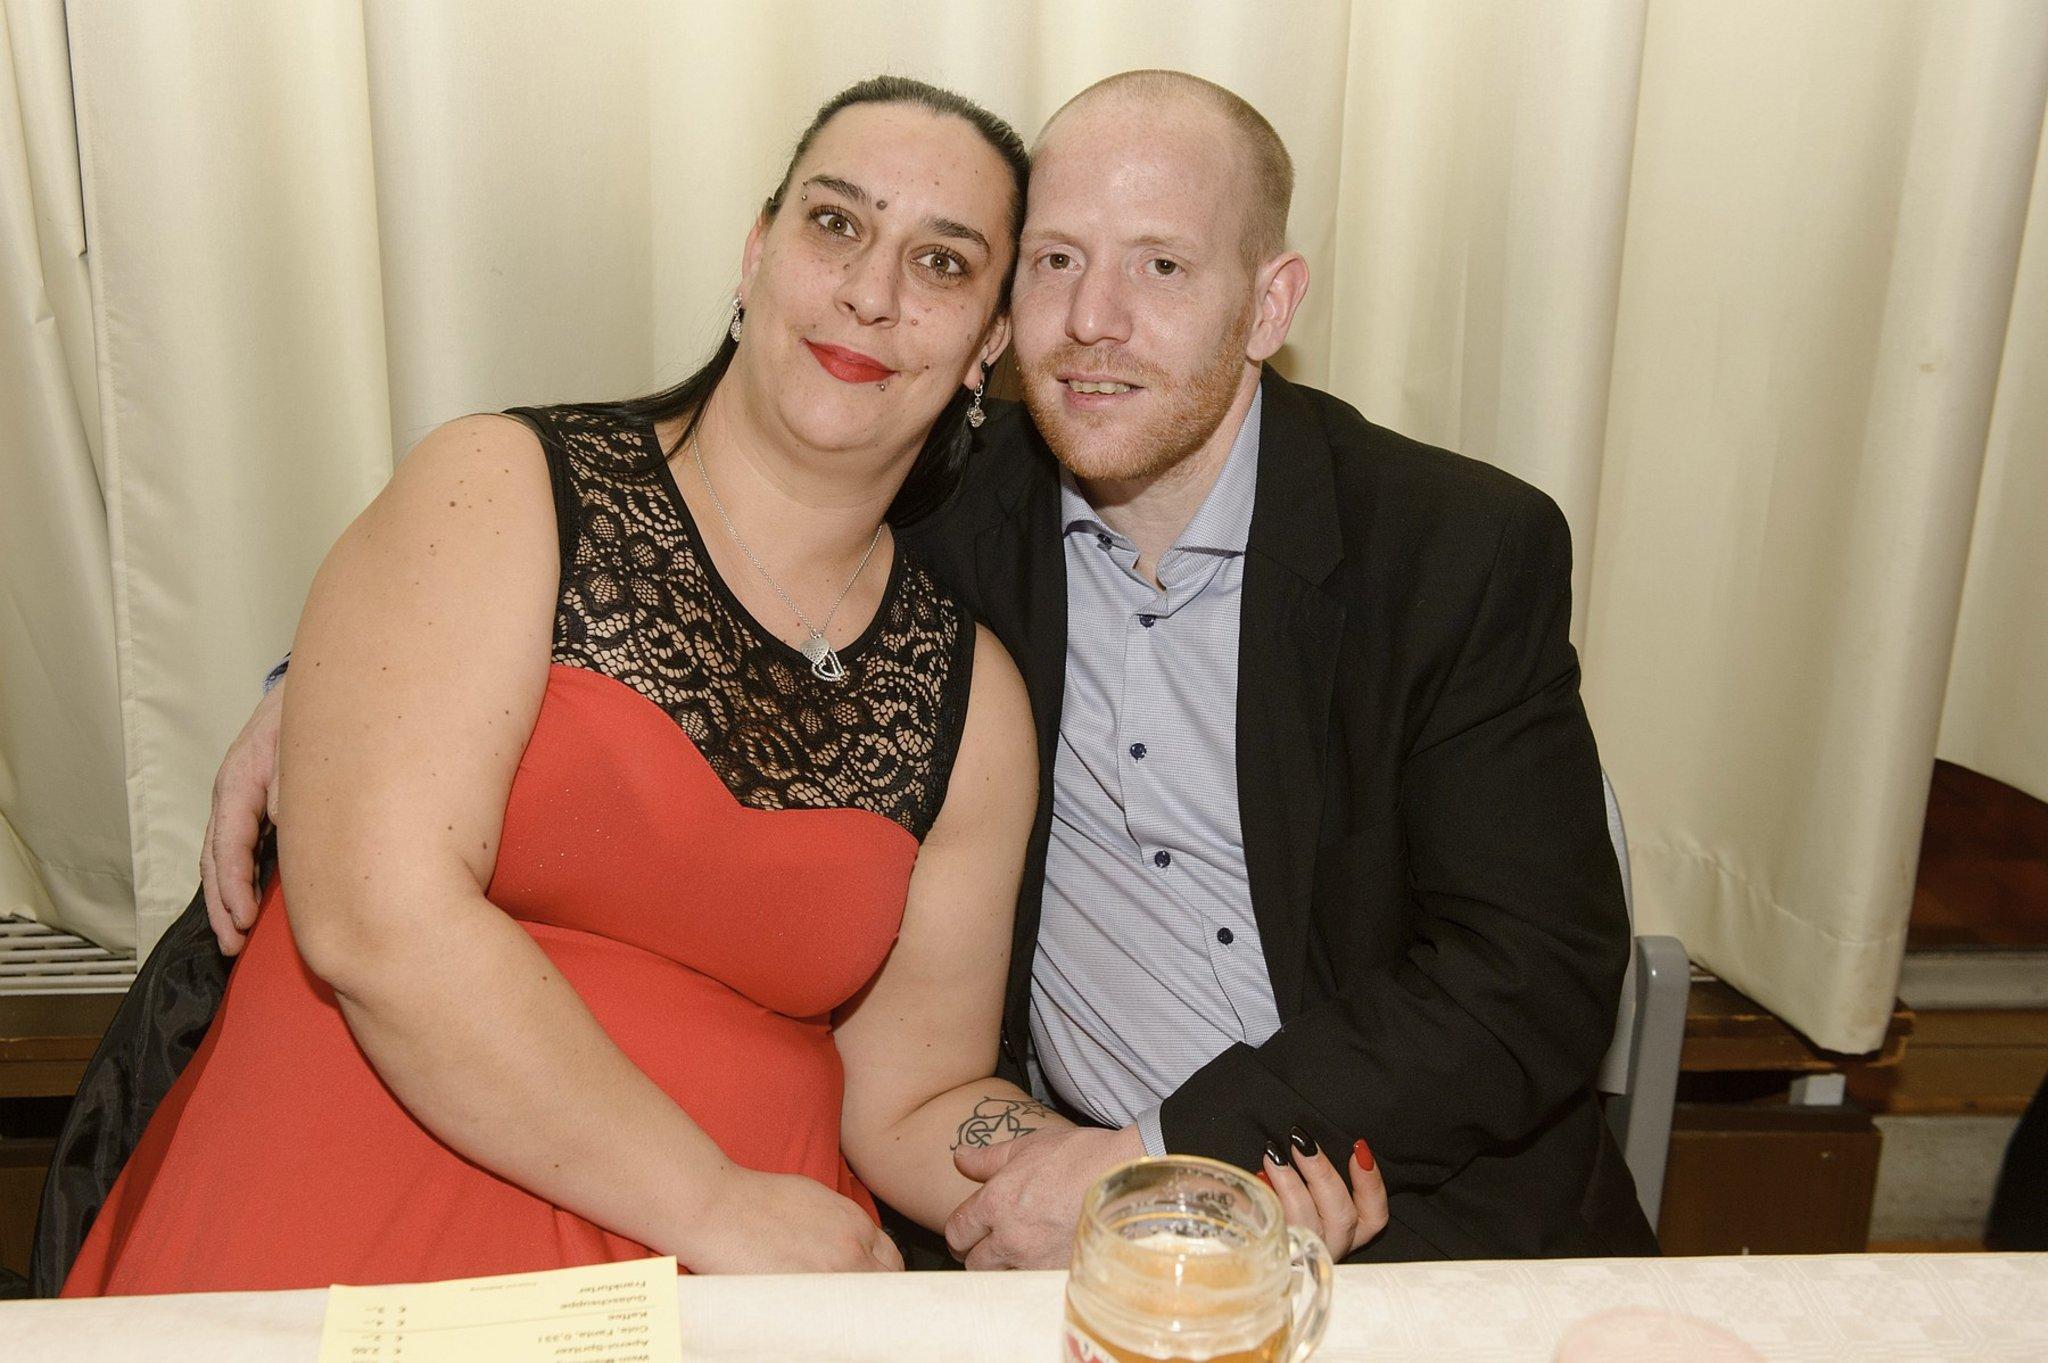 Sarleinsbach Dating Events Viktring Single Mann Single